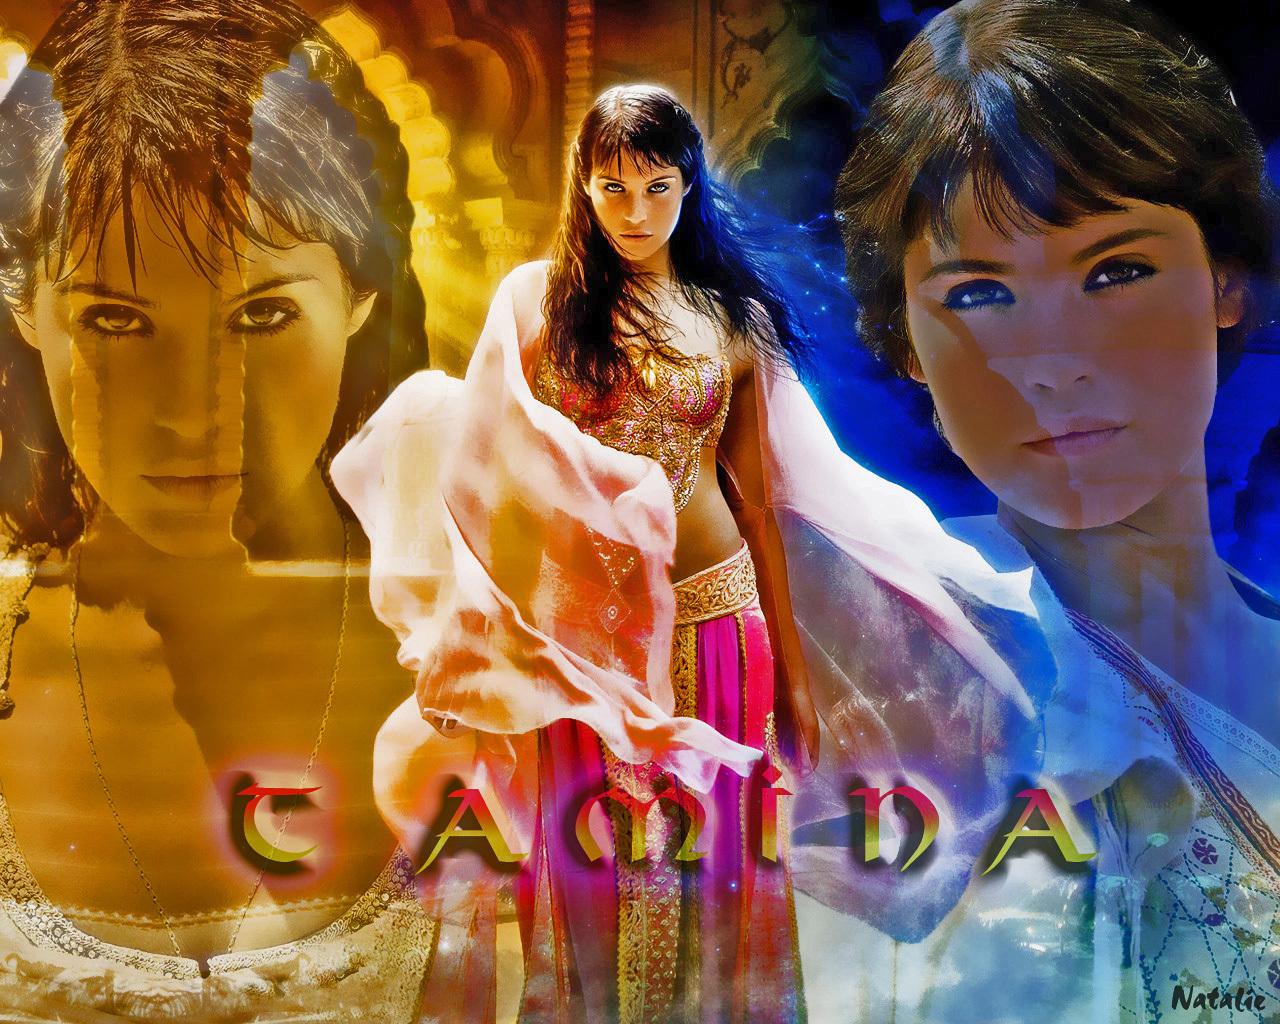 Princess Tamina - Prince of Persia: The Sands of Time ...